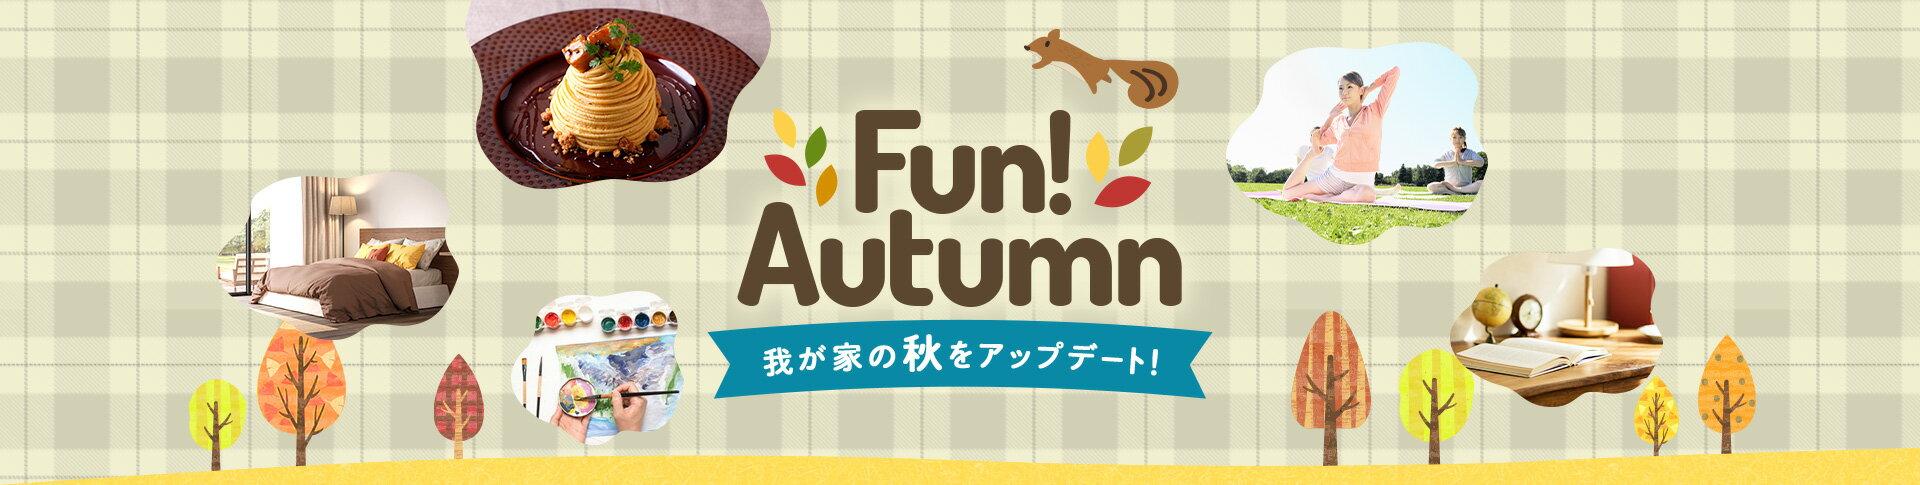 Fun! Autumn